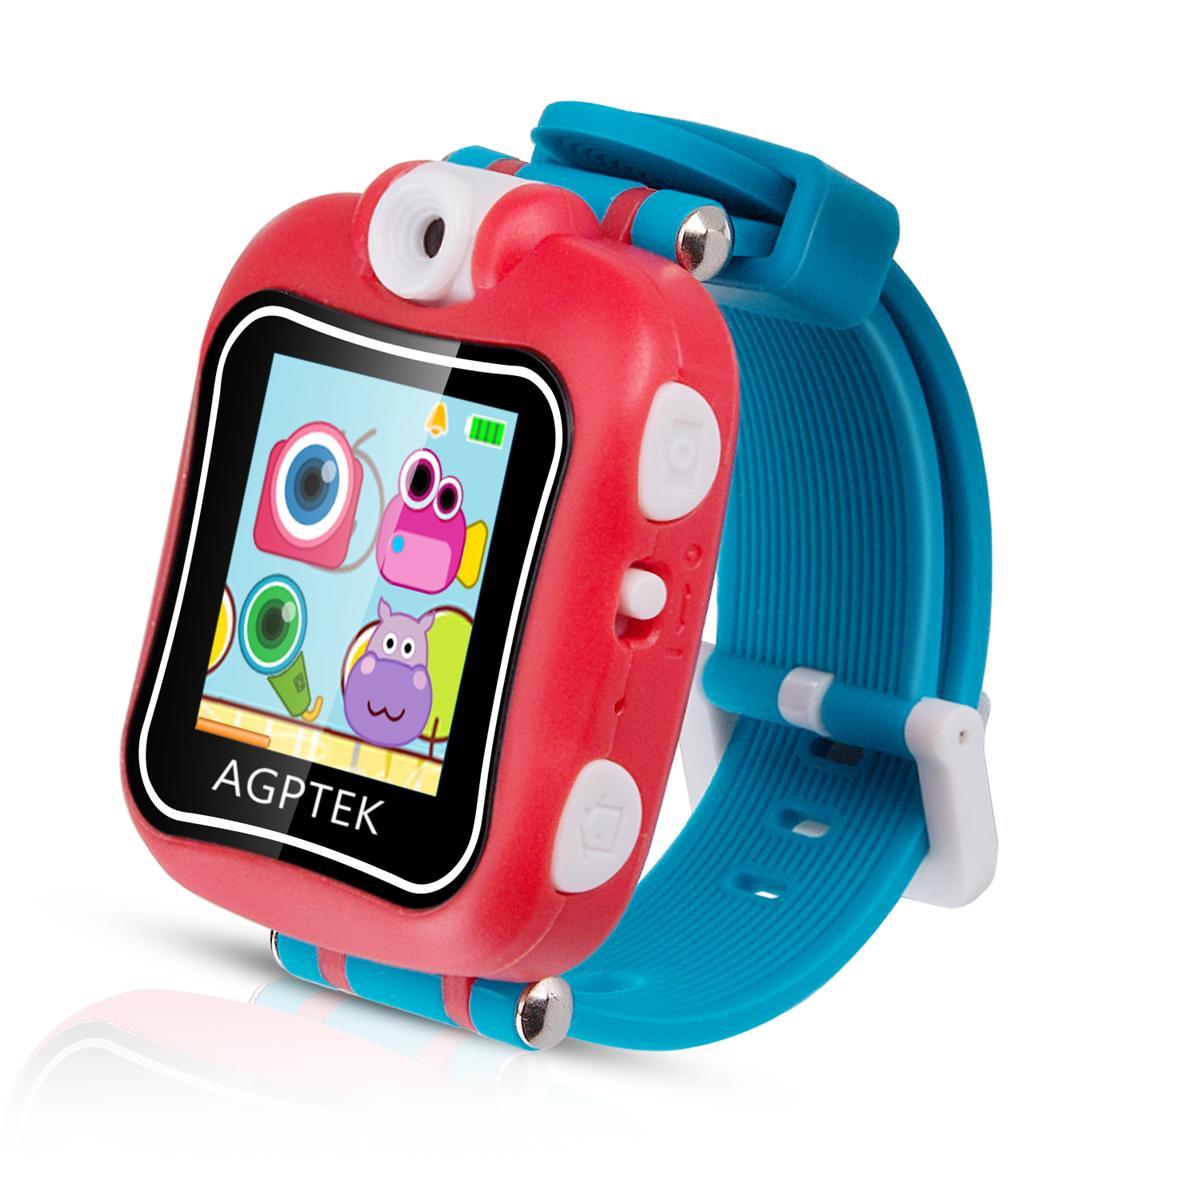 AGPTEK キャラクター時計 プレイウォッチ おもちゃ 子供用 スマートウォッチ 多機能腕時計 タッチパネル 日本語取扱説明書付属 保証1年 クリスマスプレゼント ギフト